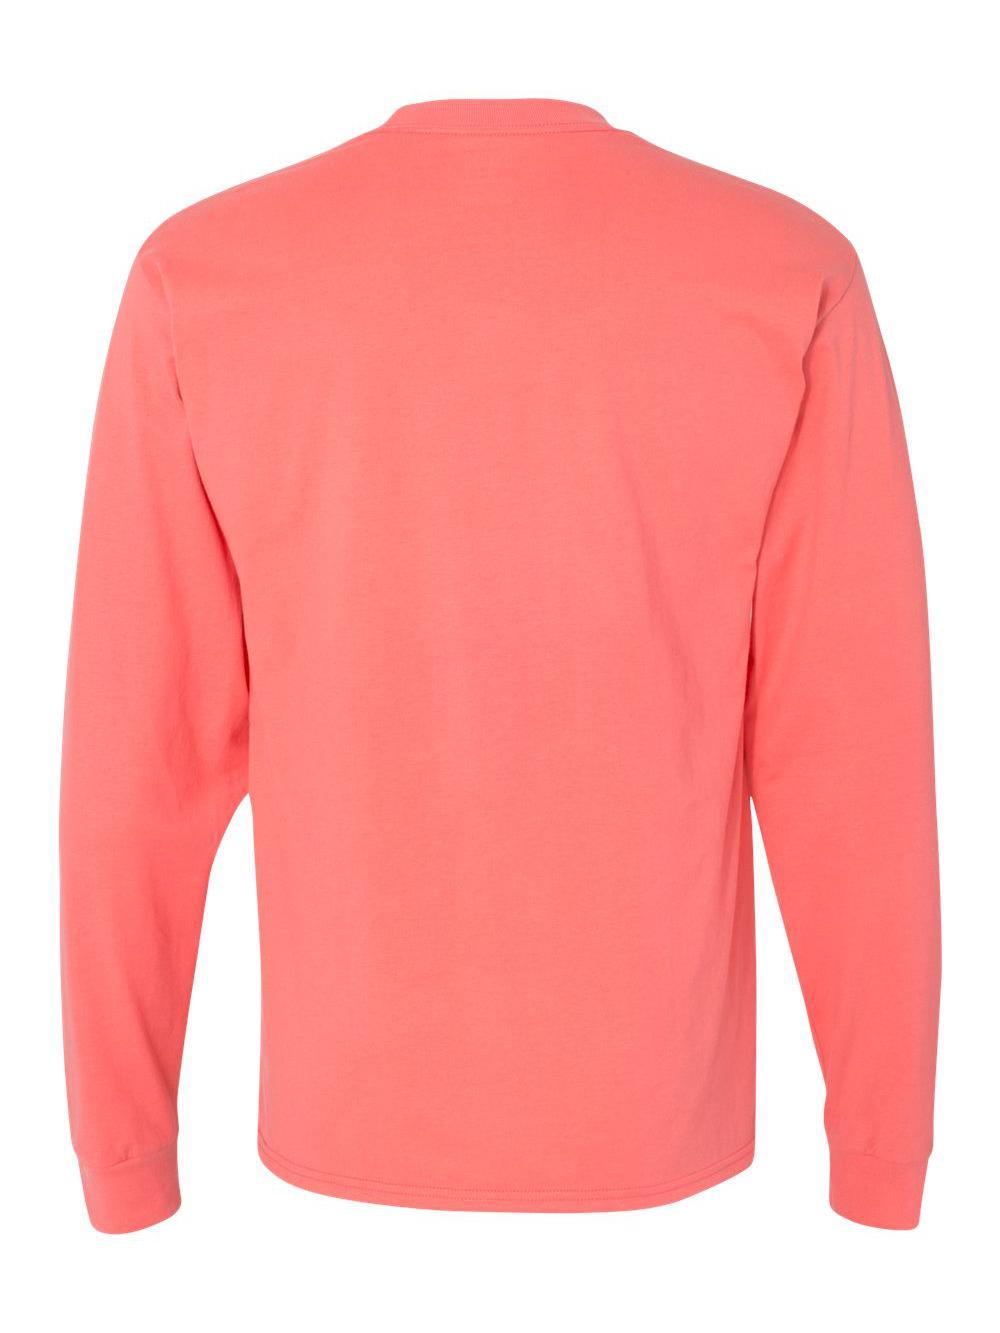 Hanes-Beefy-T-Long-Sleeve-T-Shirt-5186 thumbnail 19